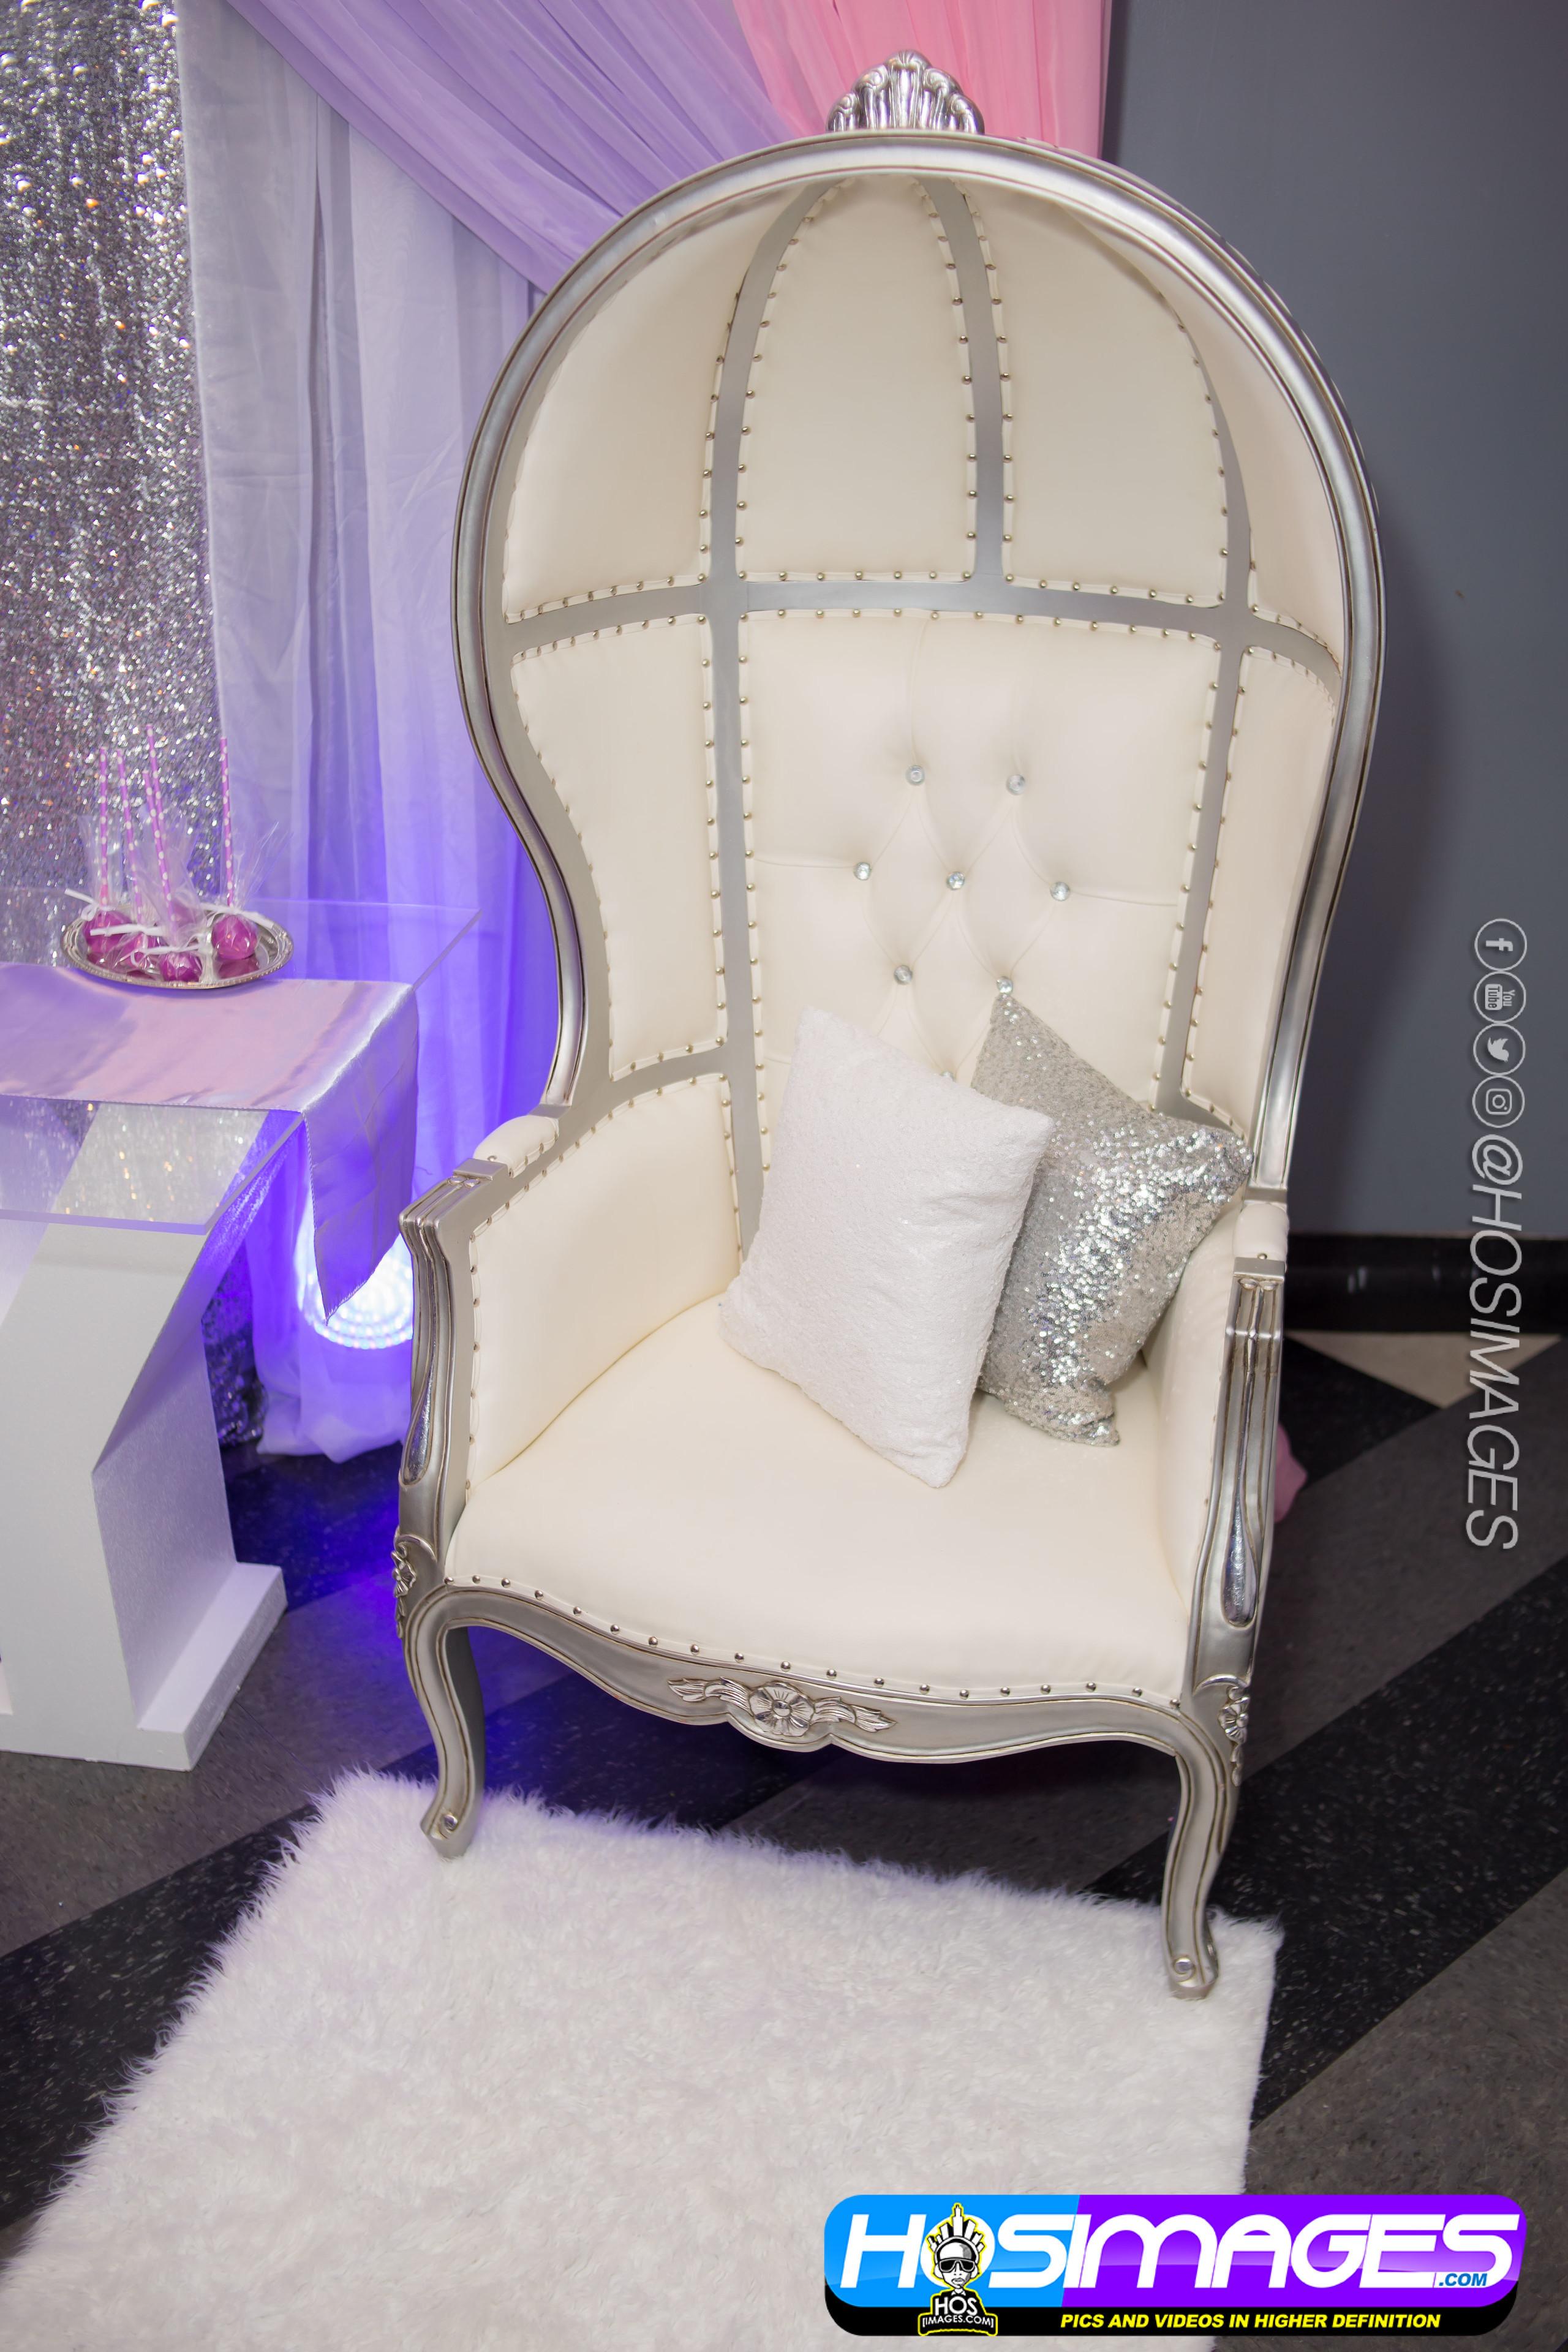 Silver & White Dome Chair